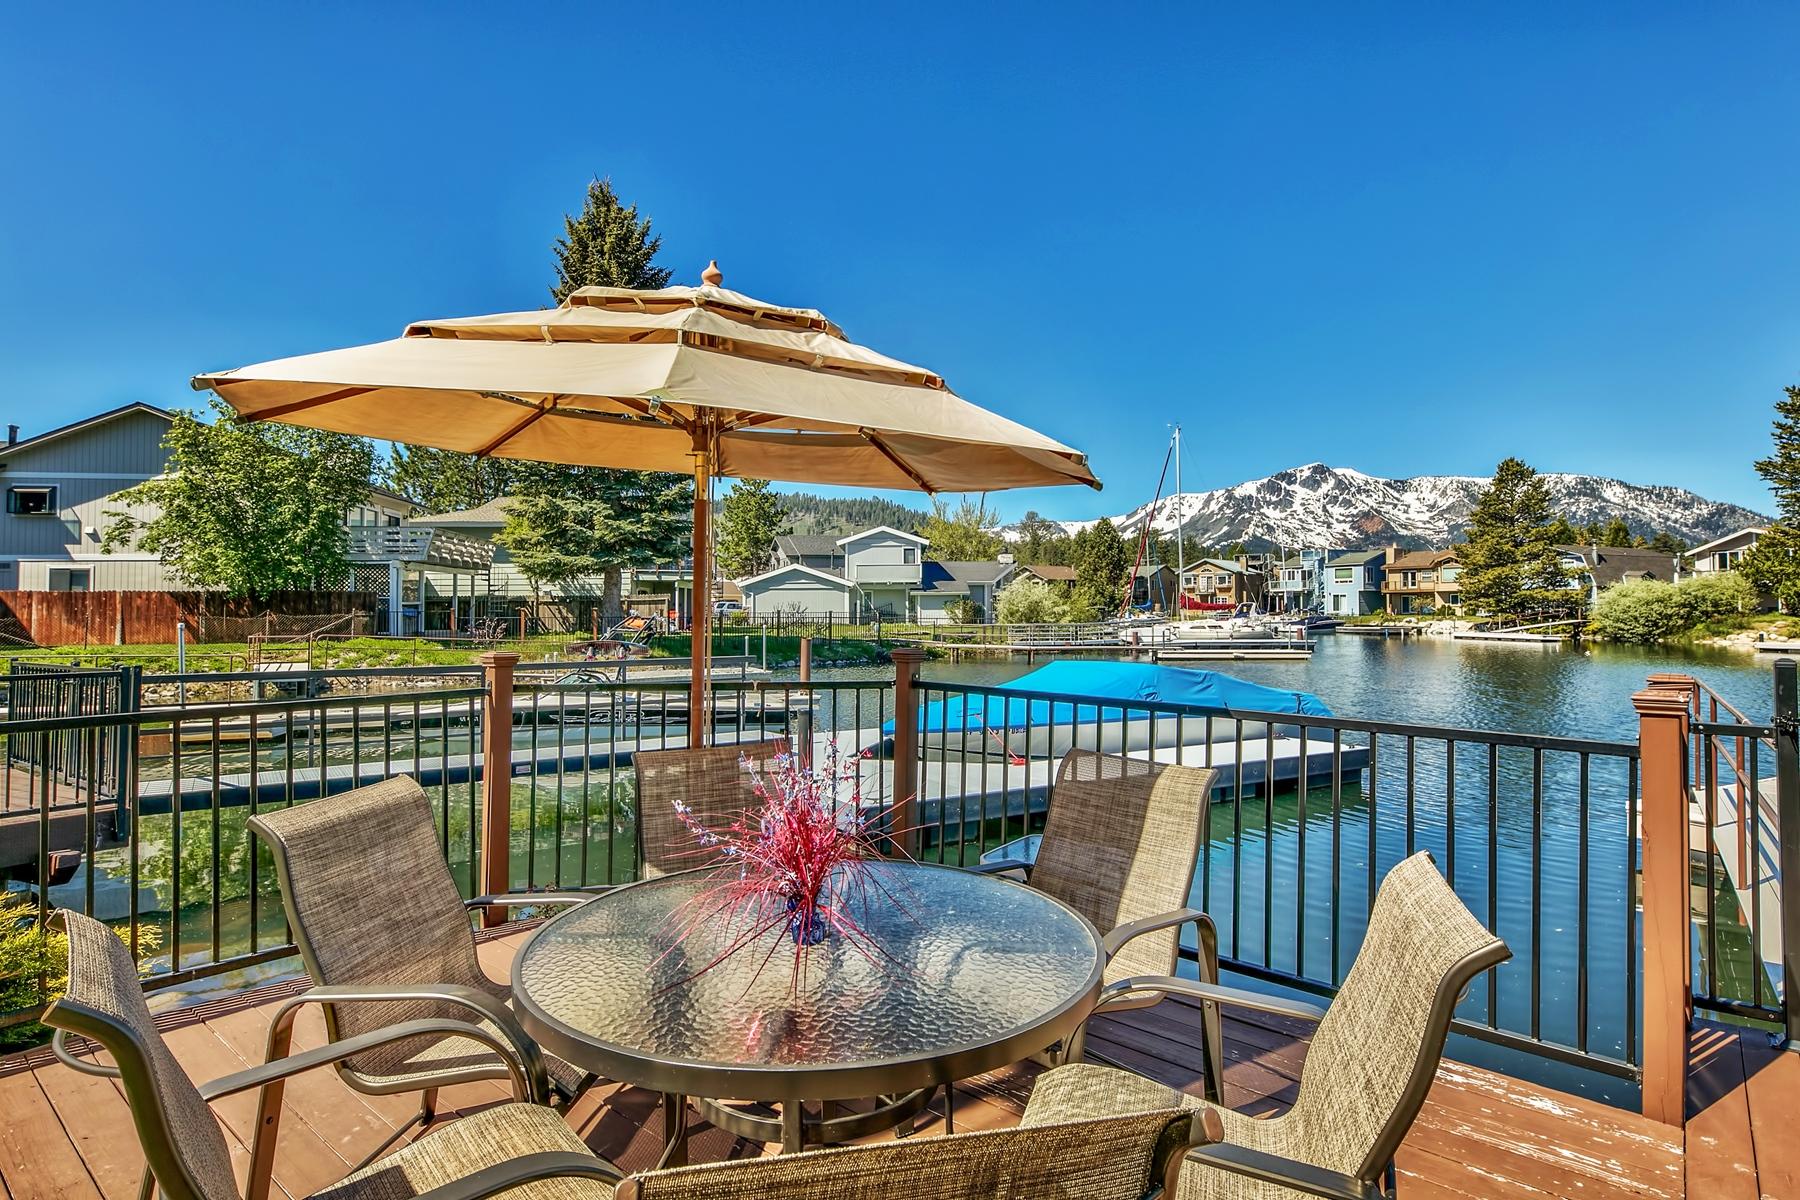 Additional photo for property listing at 560 Alpine Drive, South Lake Tahoe, CA 96150 560 Alpine Drive South Lake Tahoe, California 96150 Estados Unidos